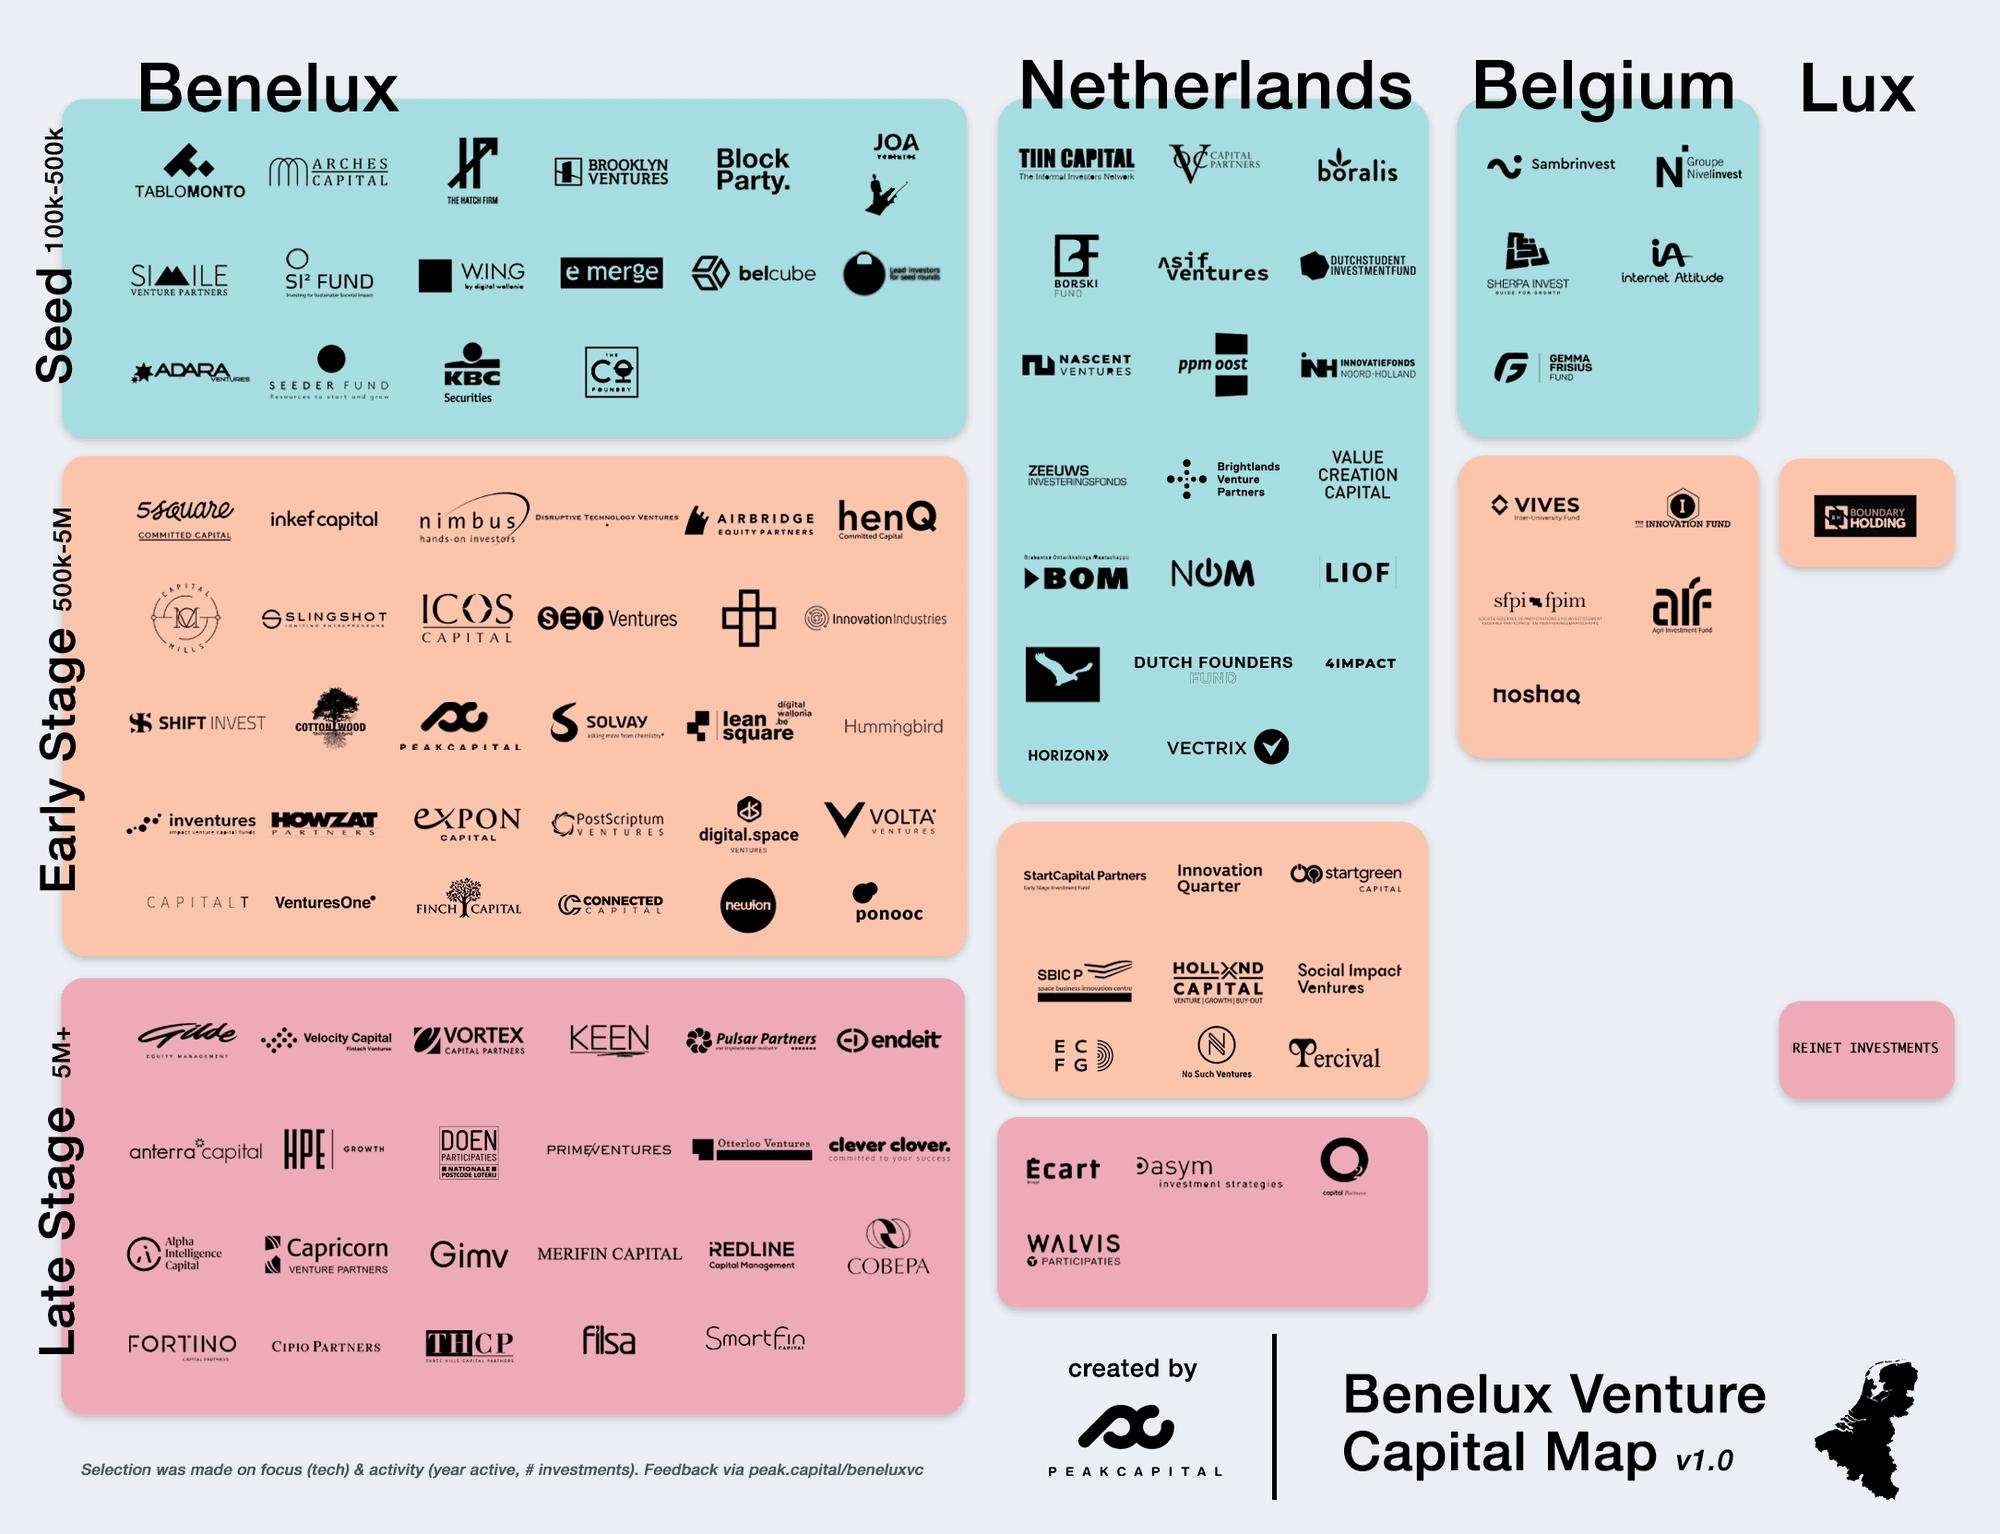 Benelux Venture Capital Map 2020Q2 (v1.0)